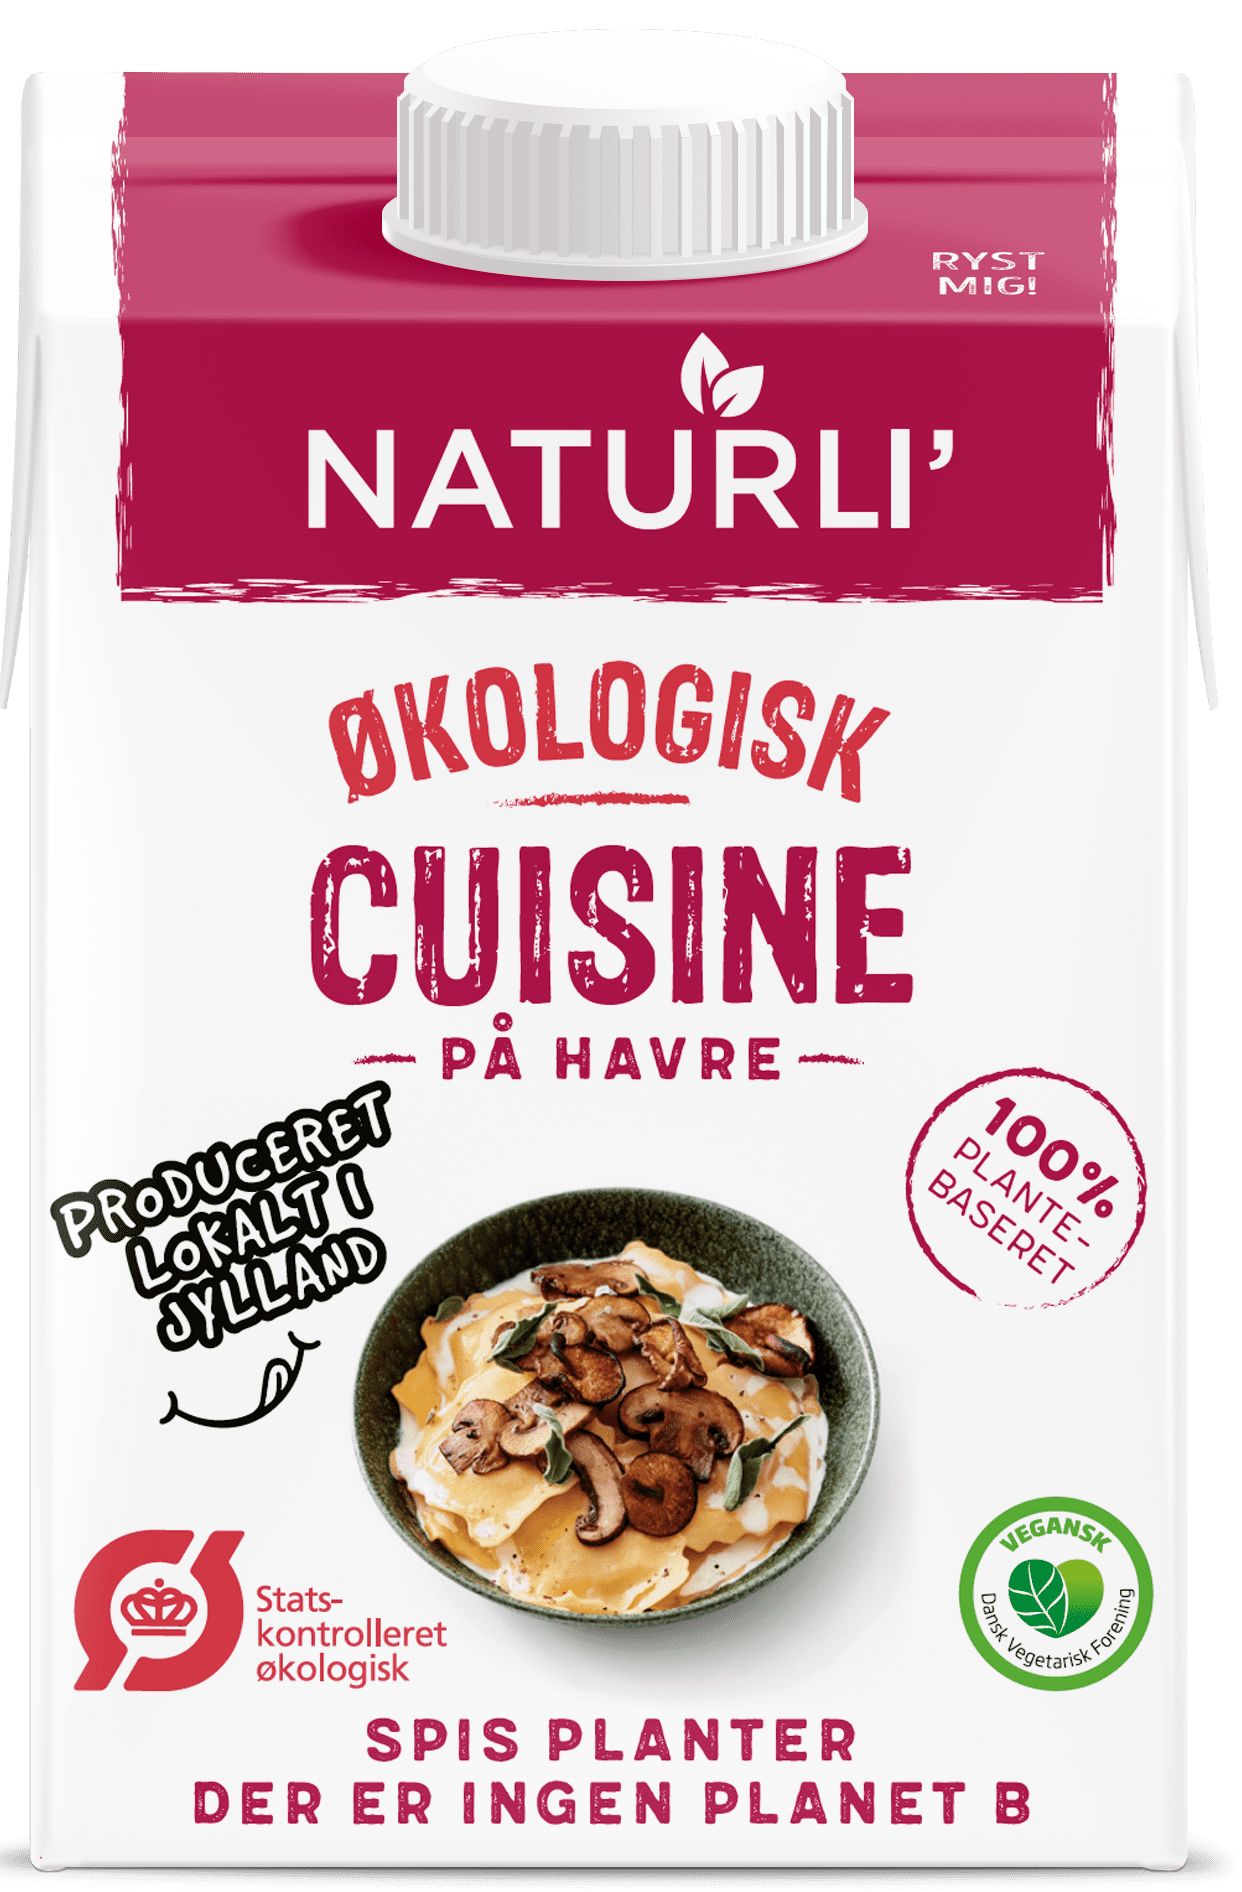 Havre Cuisine